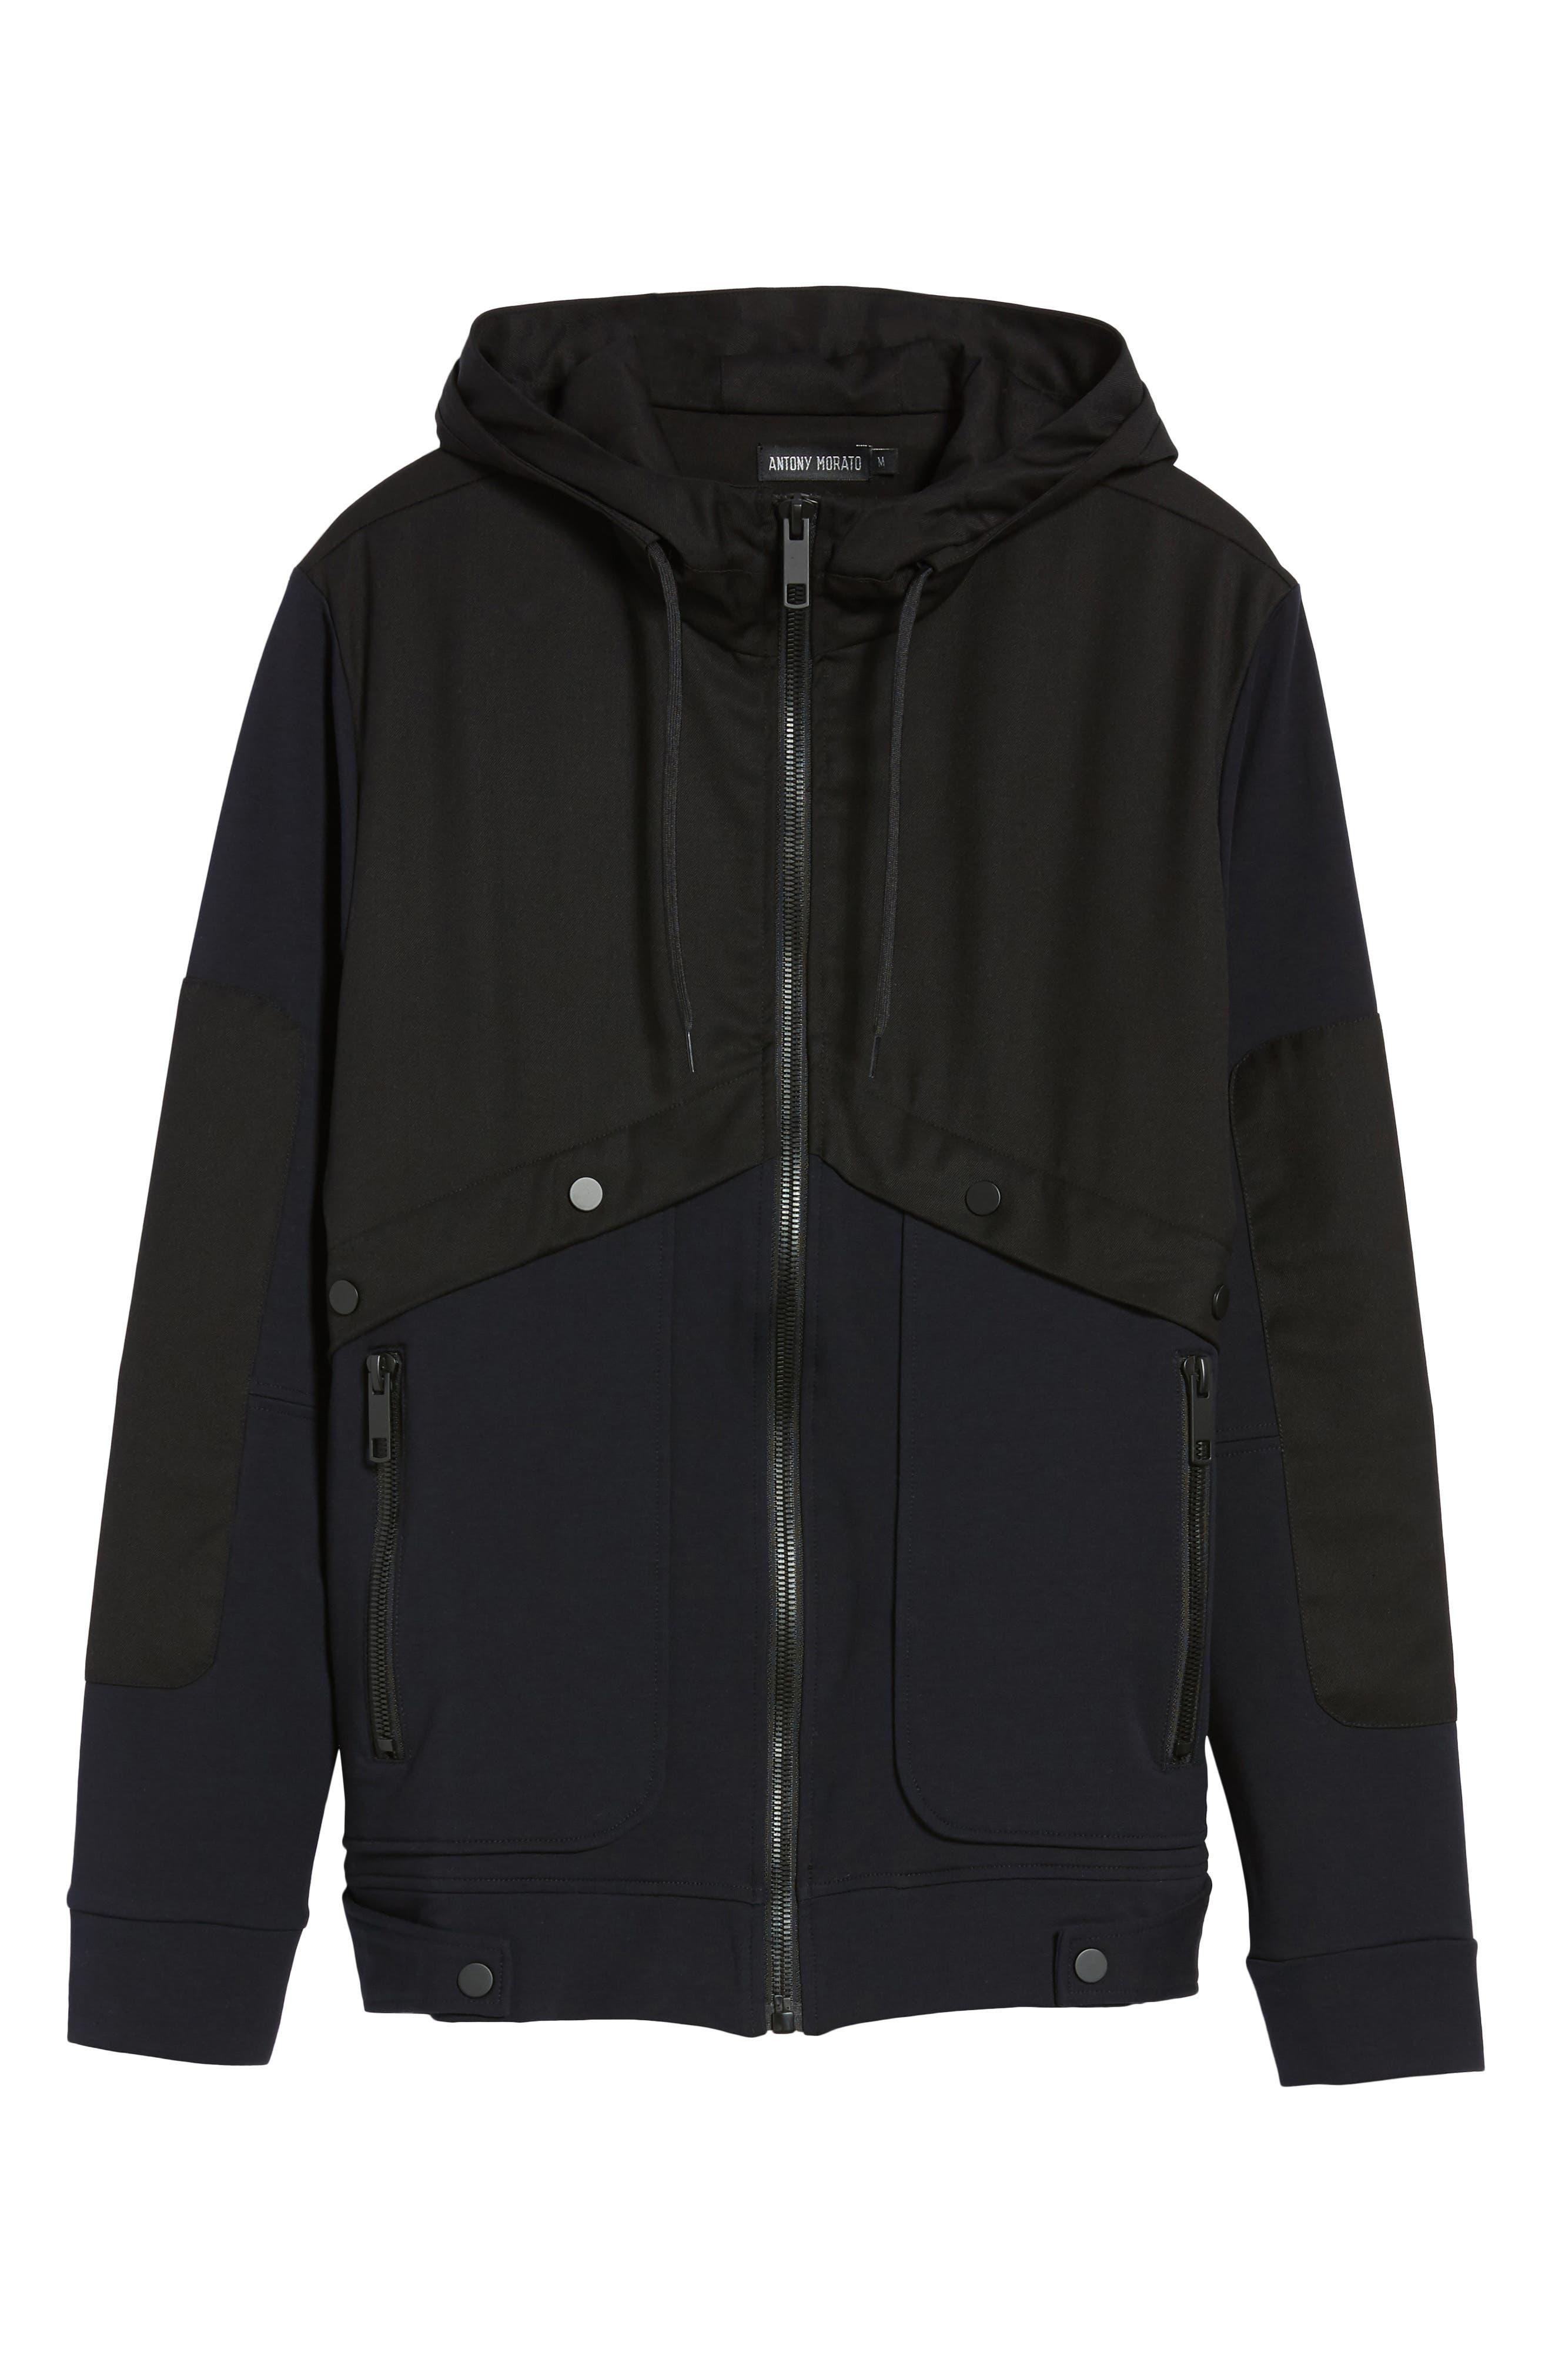 Fleece Zip Up Jacket,                             Alternate thumbnail 6, color,                             Black